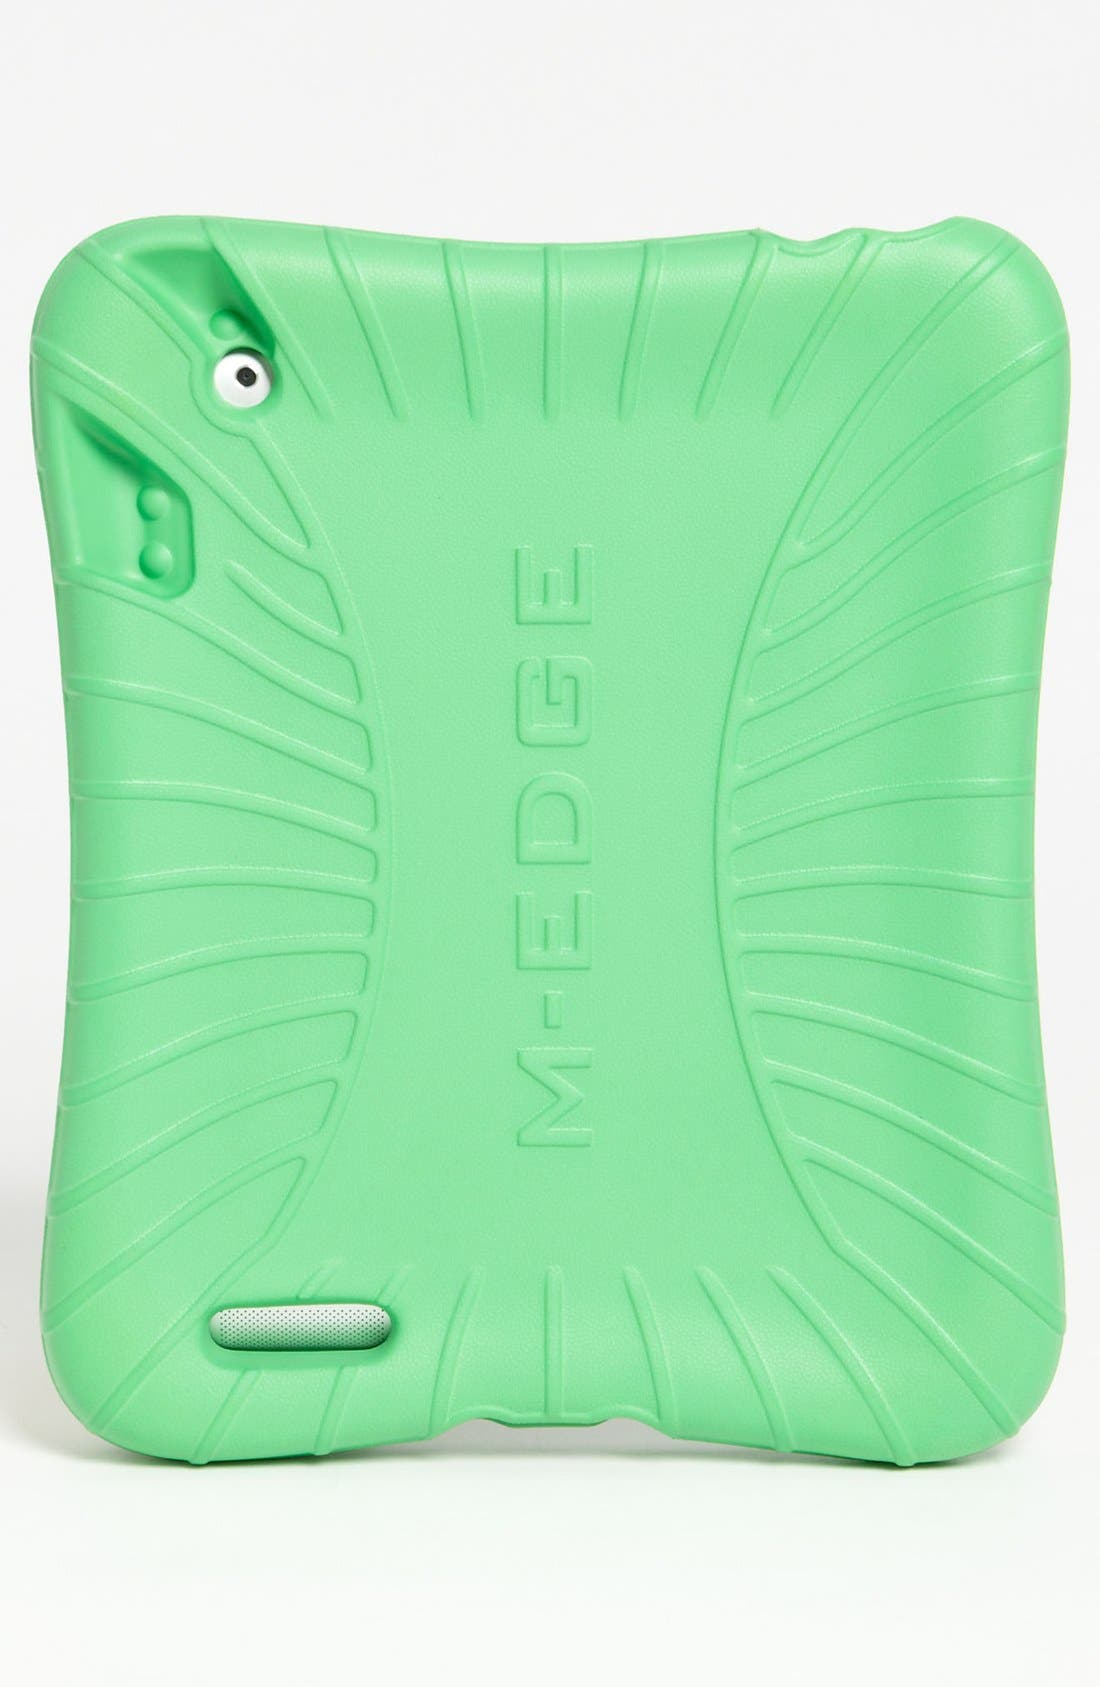 Alternate Image 2  - M-Edge 'Super Shell' Protective iPad 2 Case